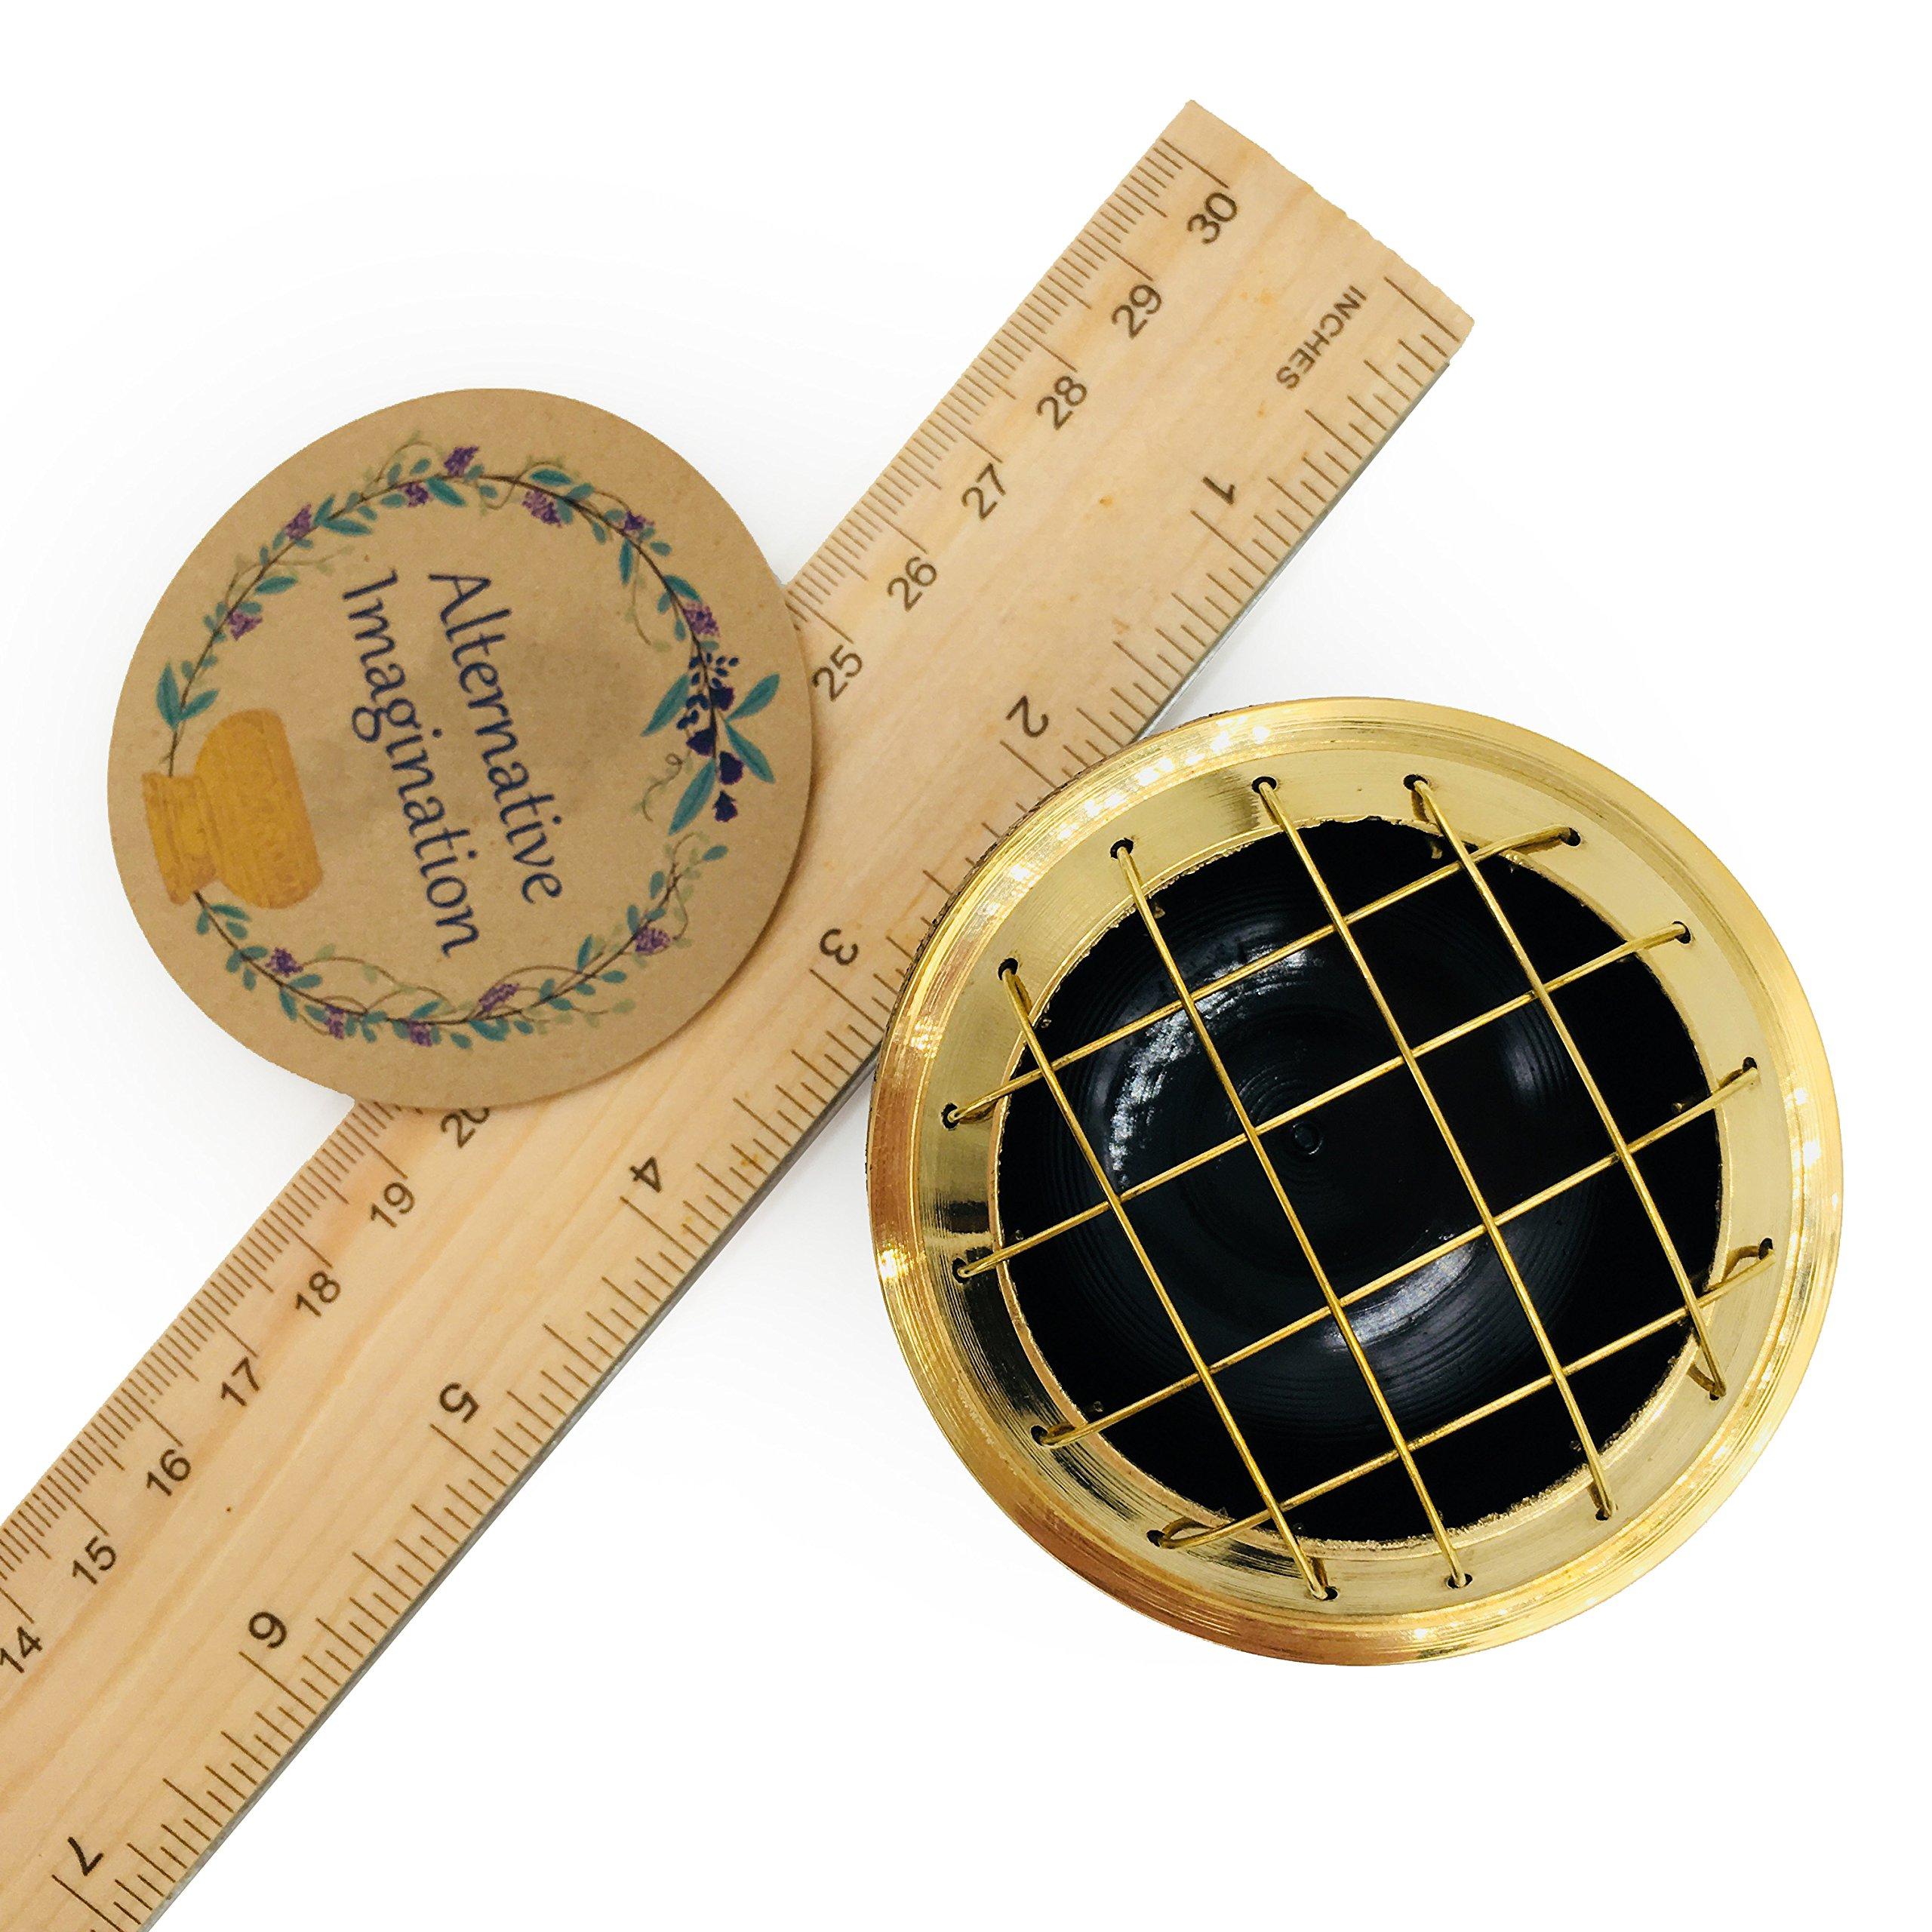 Alternative Imagination Premium Copal Burning Kit (with Tibetan Incense Burner or Brass Screen Burner) (Black Brass) by Alternative Imagination (Image #7)